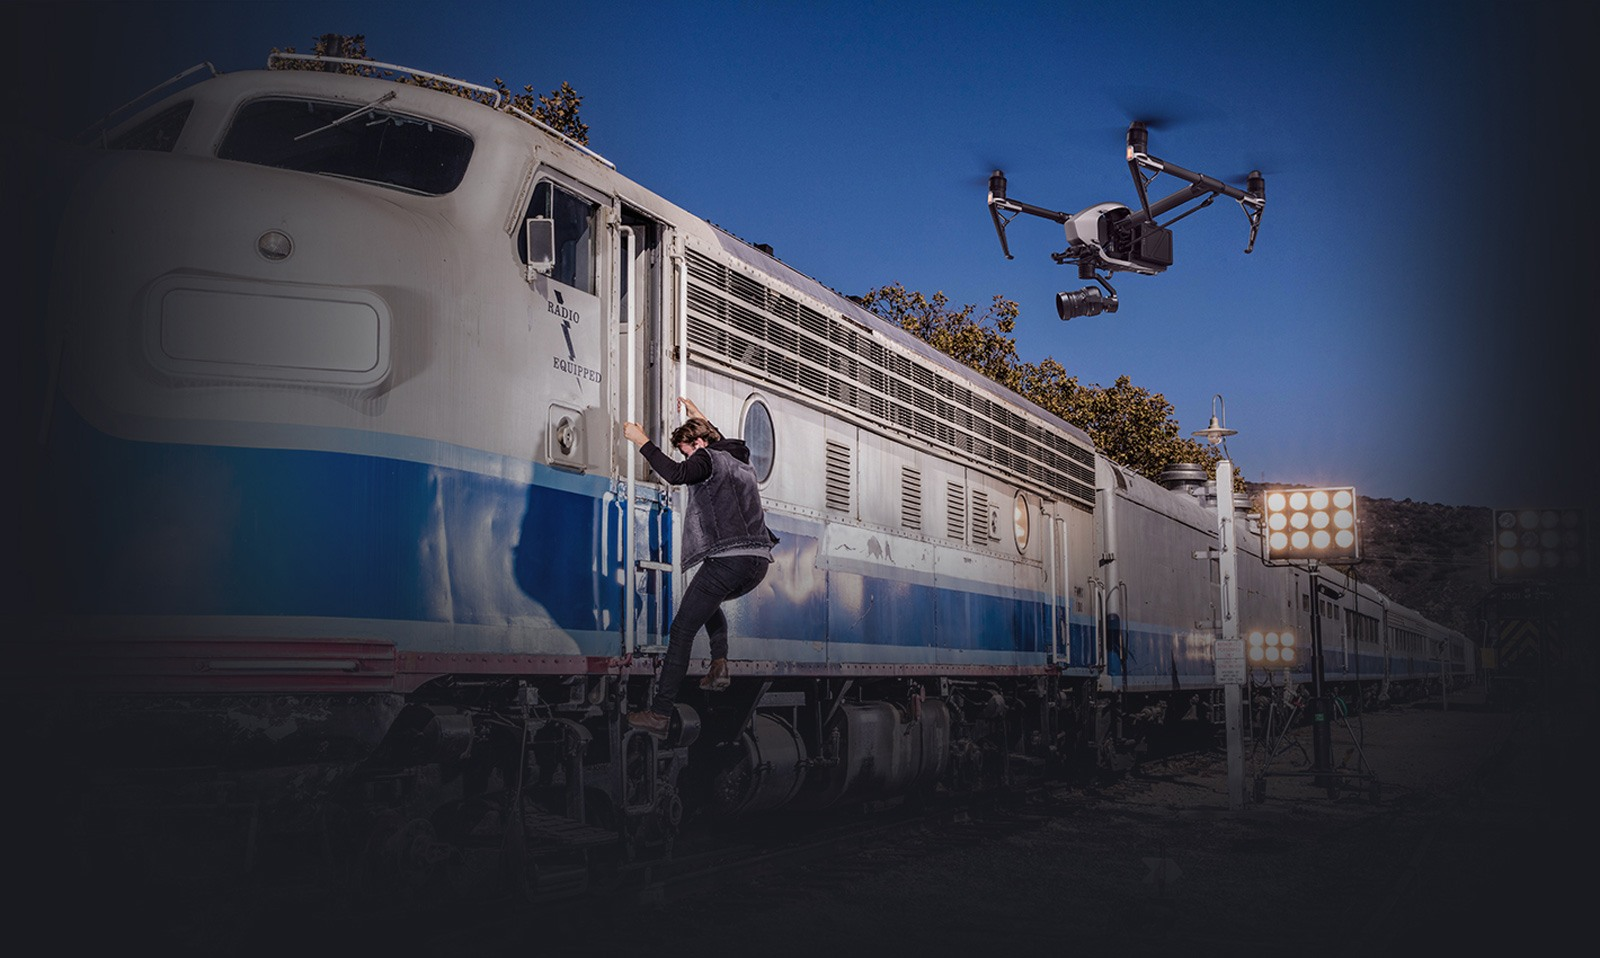 DJI Inspire 2 auto follow drone